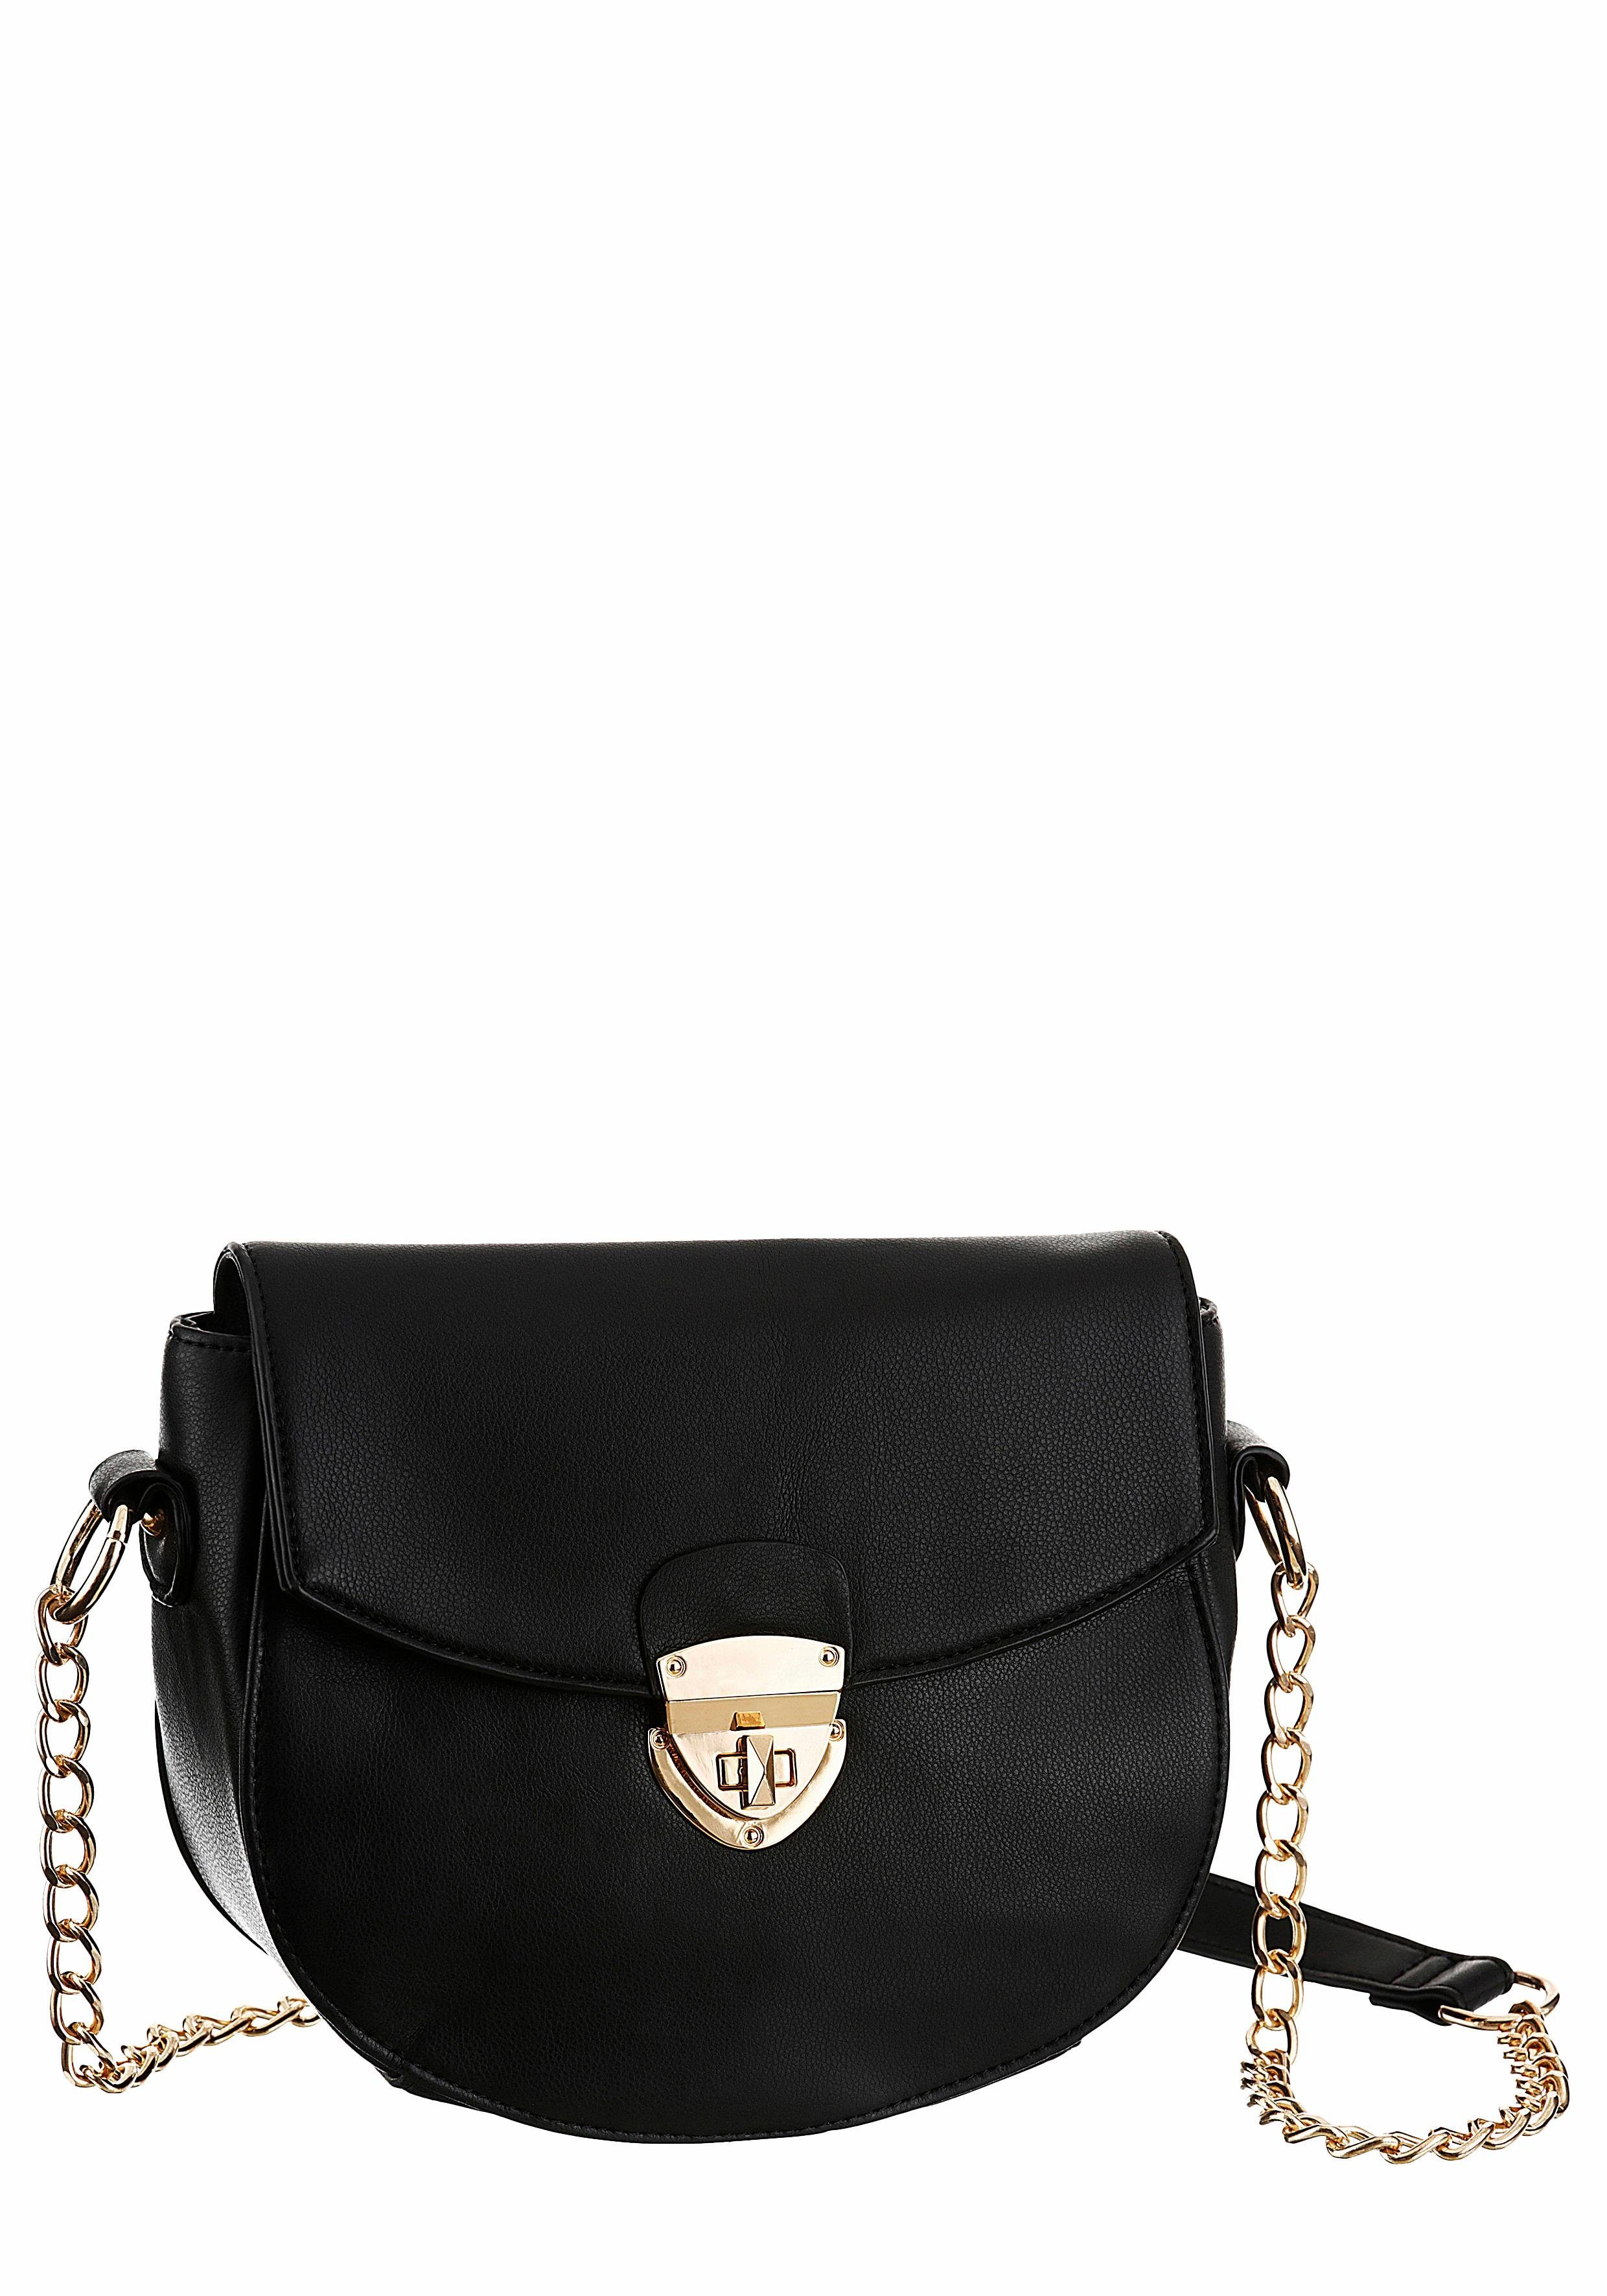 Laura Scott Mini Bag, mit trendiger Umhängekette